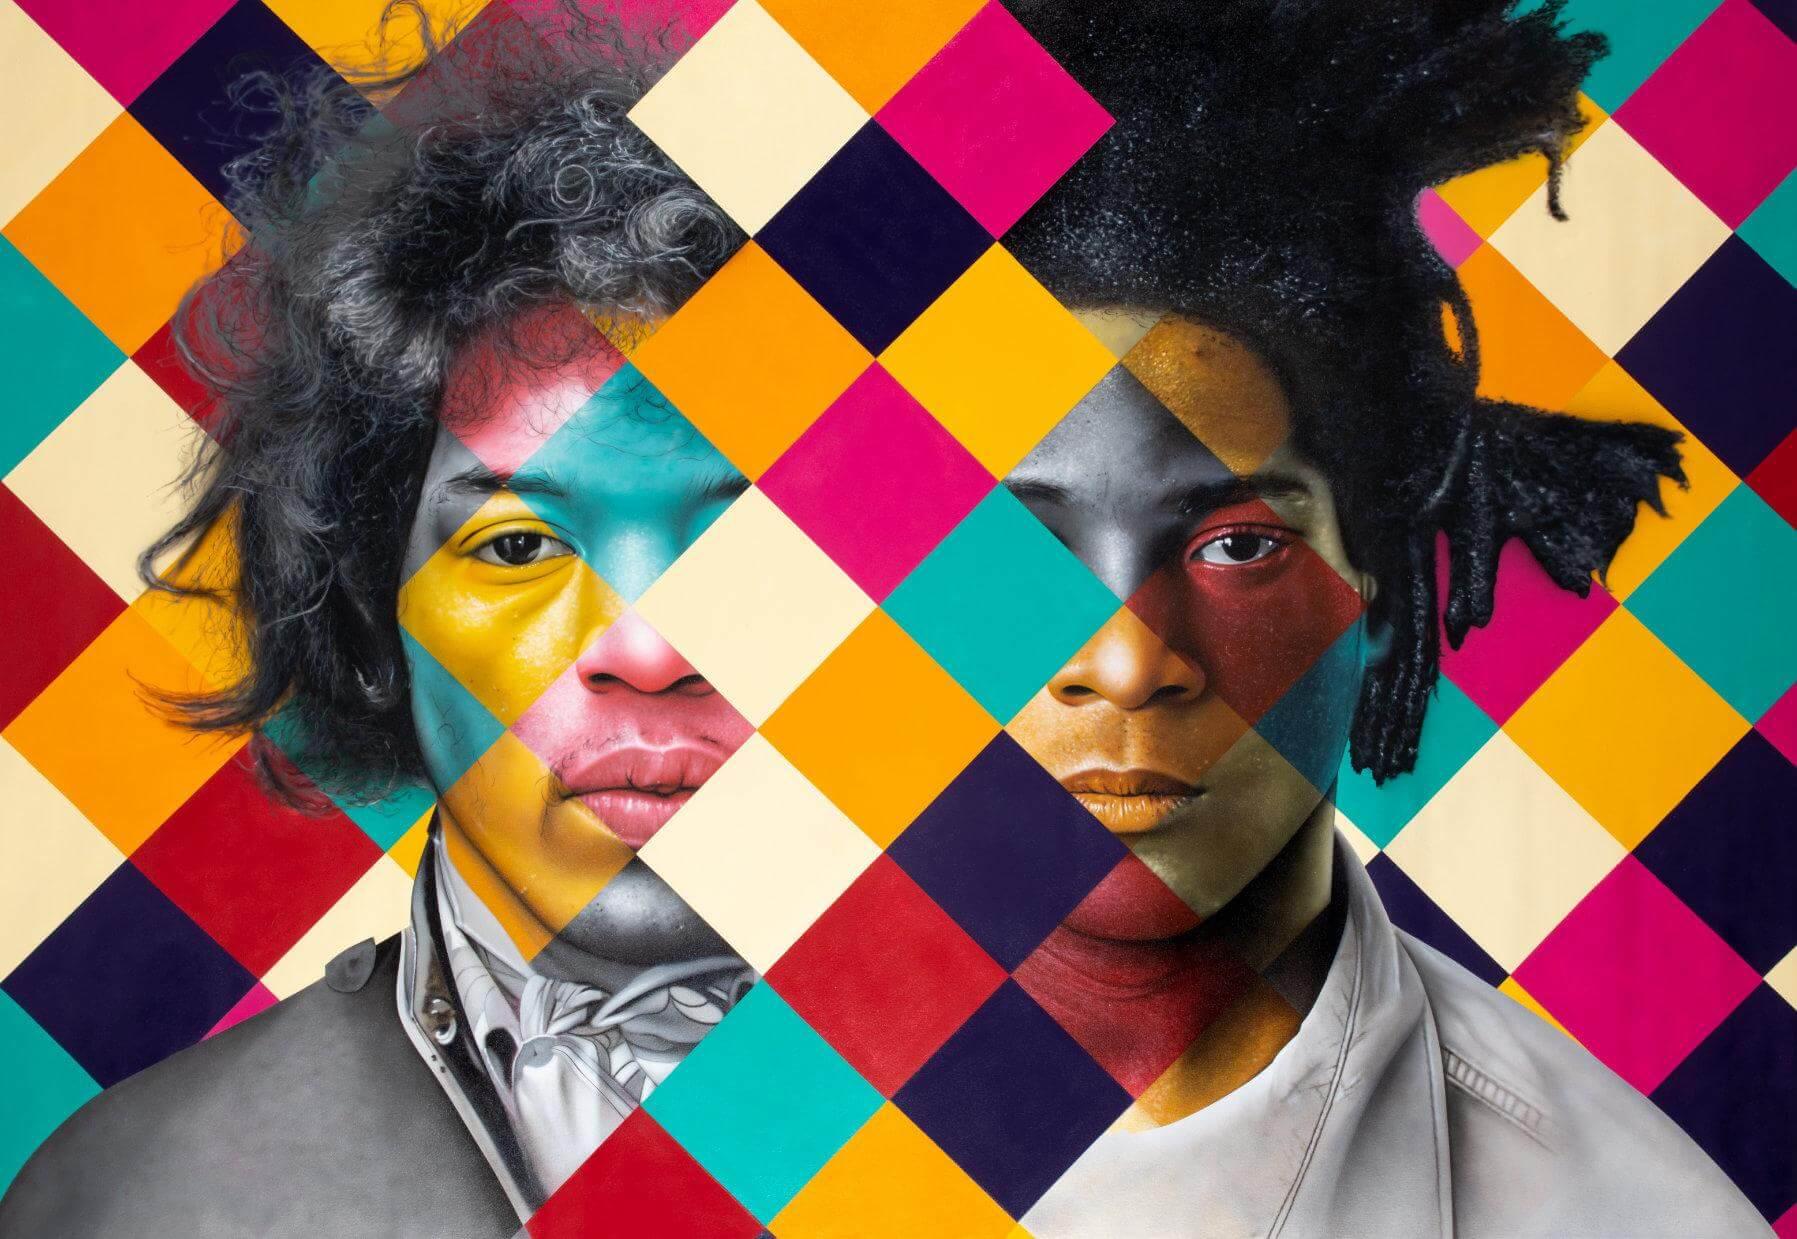 Clube 27 - Jimi Hendrix and Jean-Michel Basquiat - Eduardo Kobra - Eden Gallery